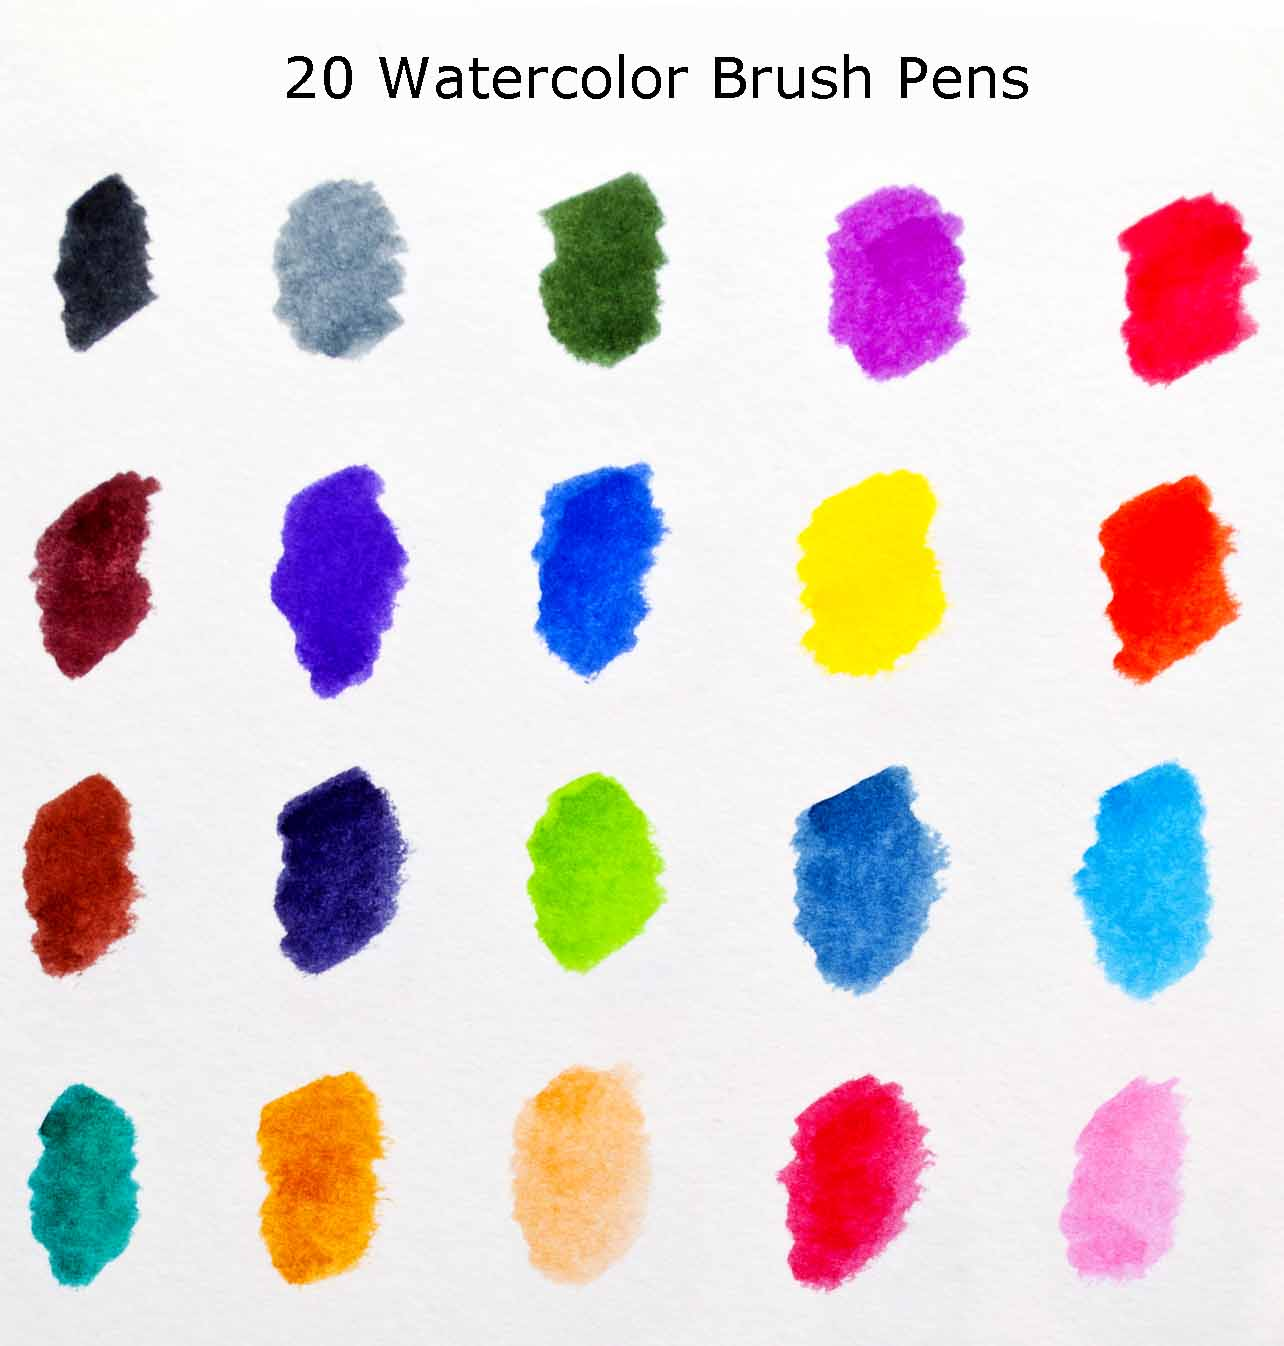 Watercolor Brush Pen Swatch.jpg